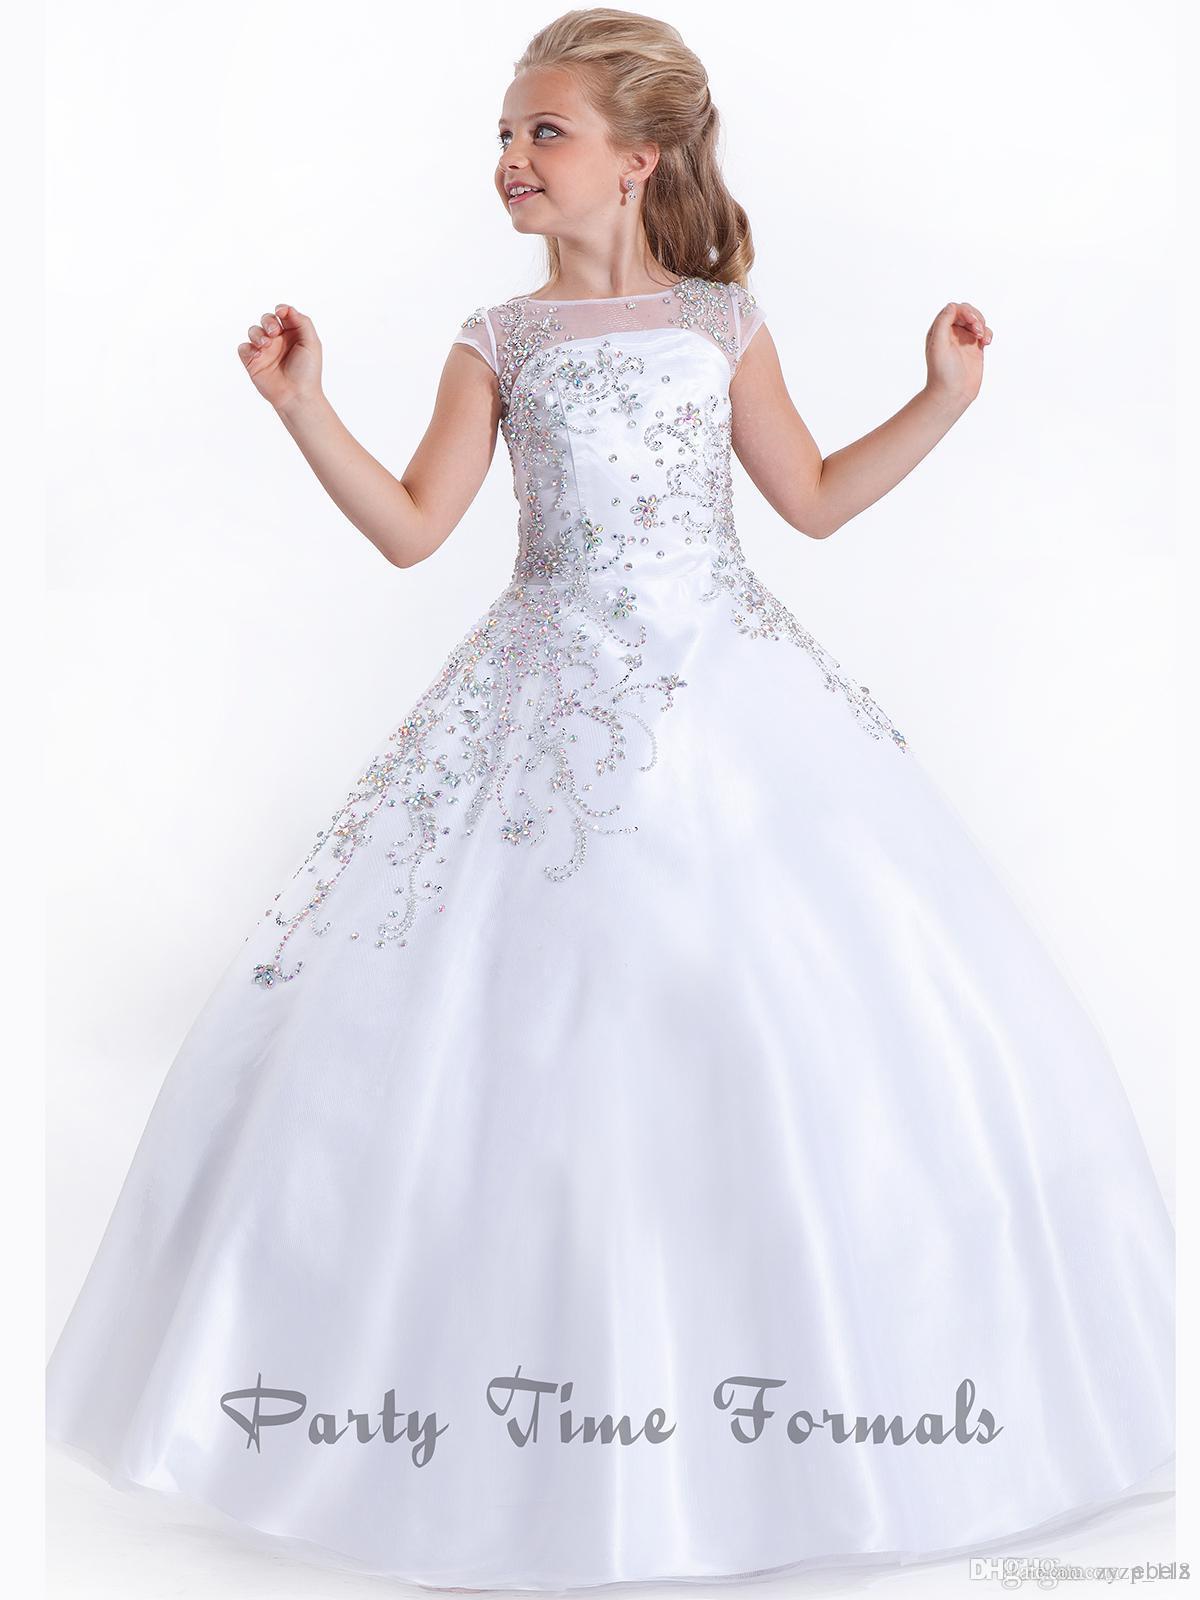 Cheap Camo Weddings Dresses Find Camo Weddings Dresses Deals On